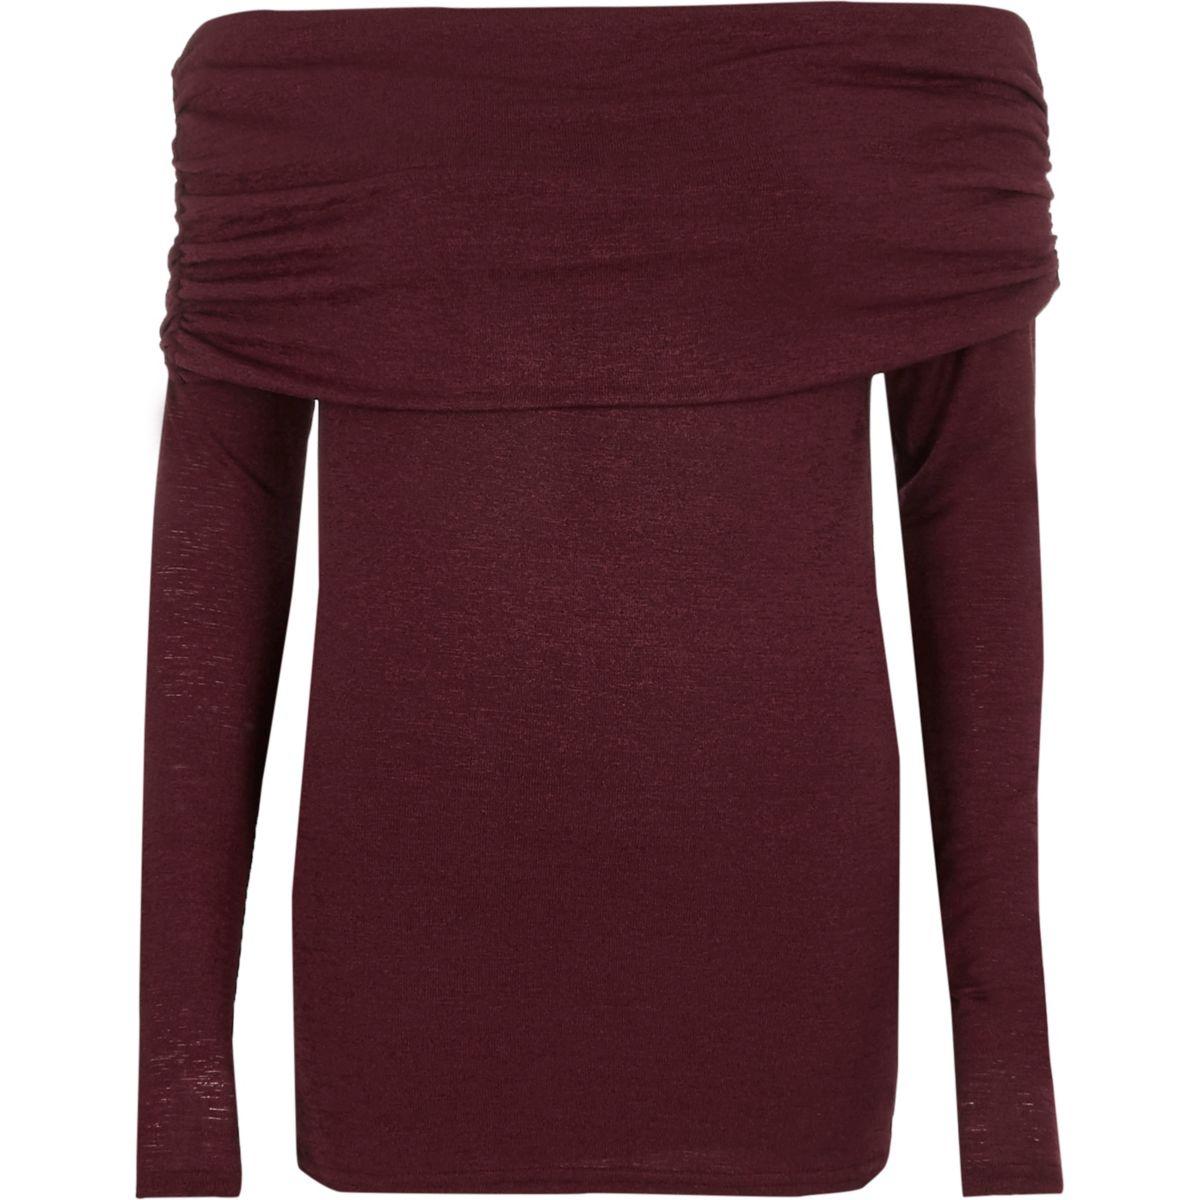 Dark red foldover bardot knitted top